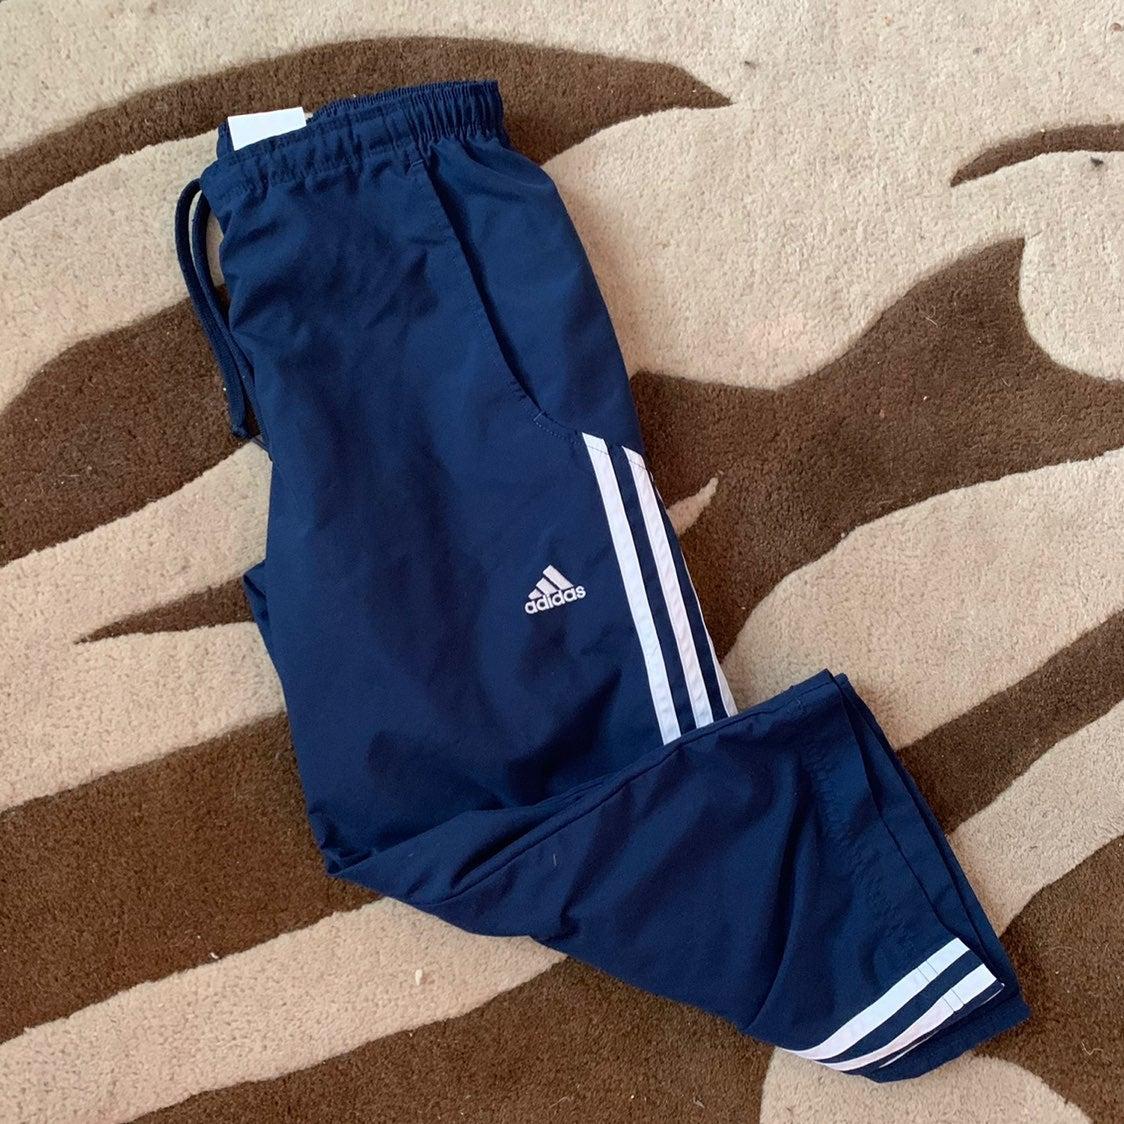 Adidas 3-stripes capri pants navy Small